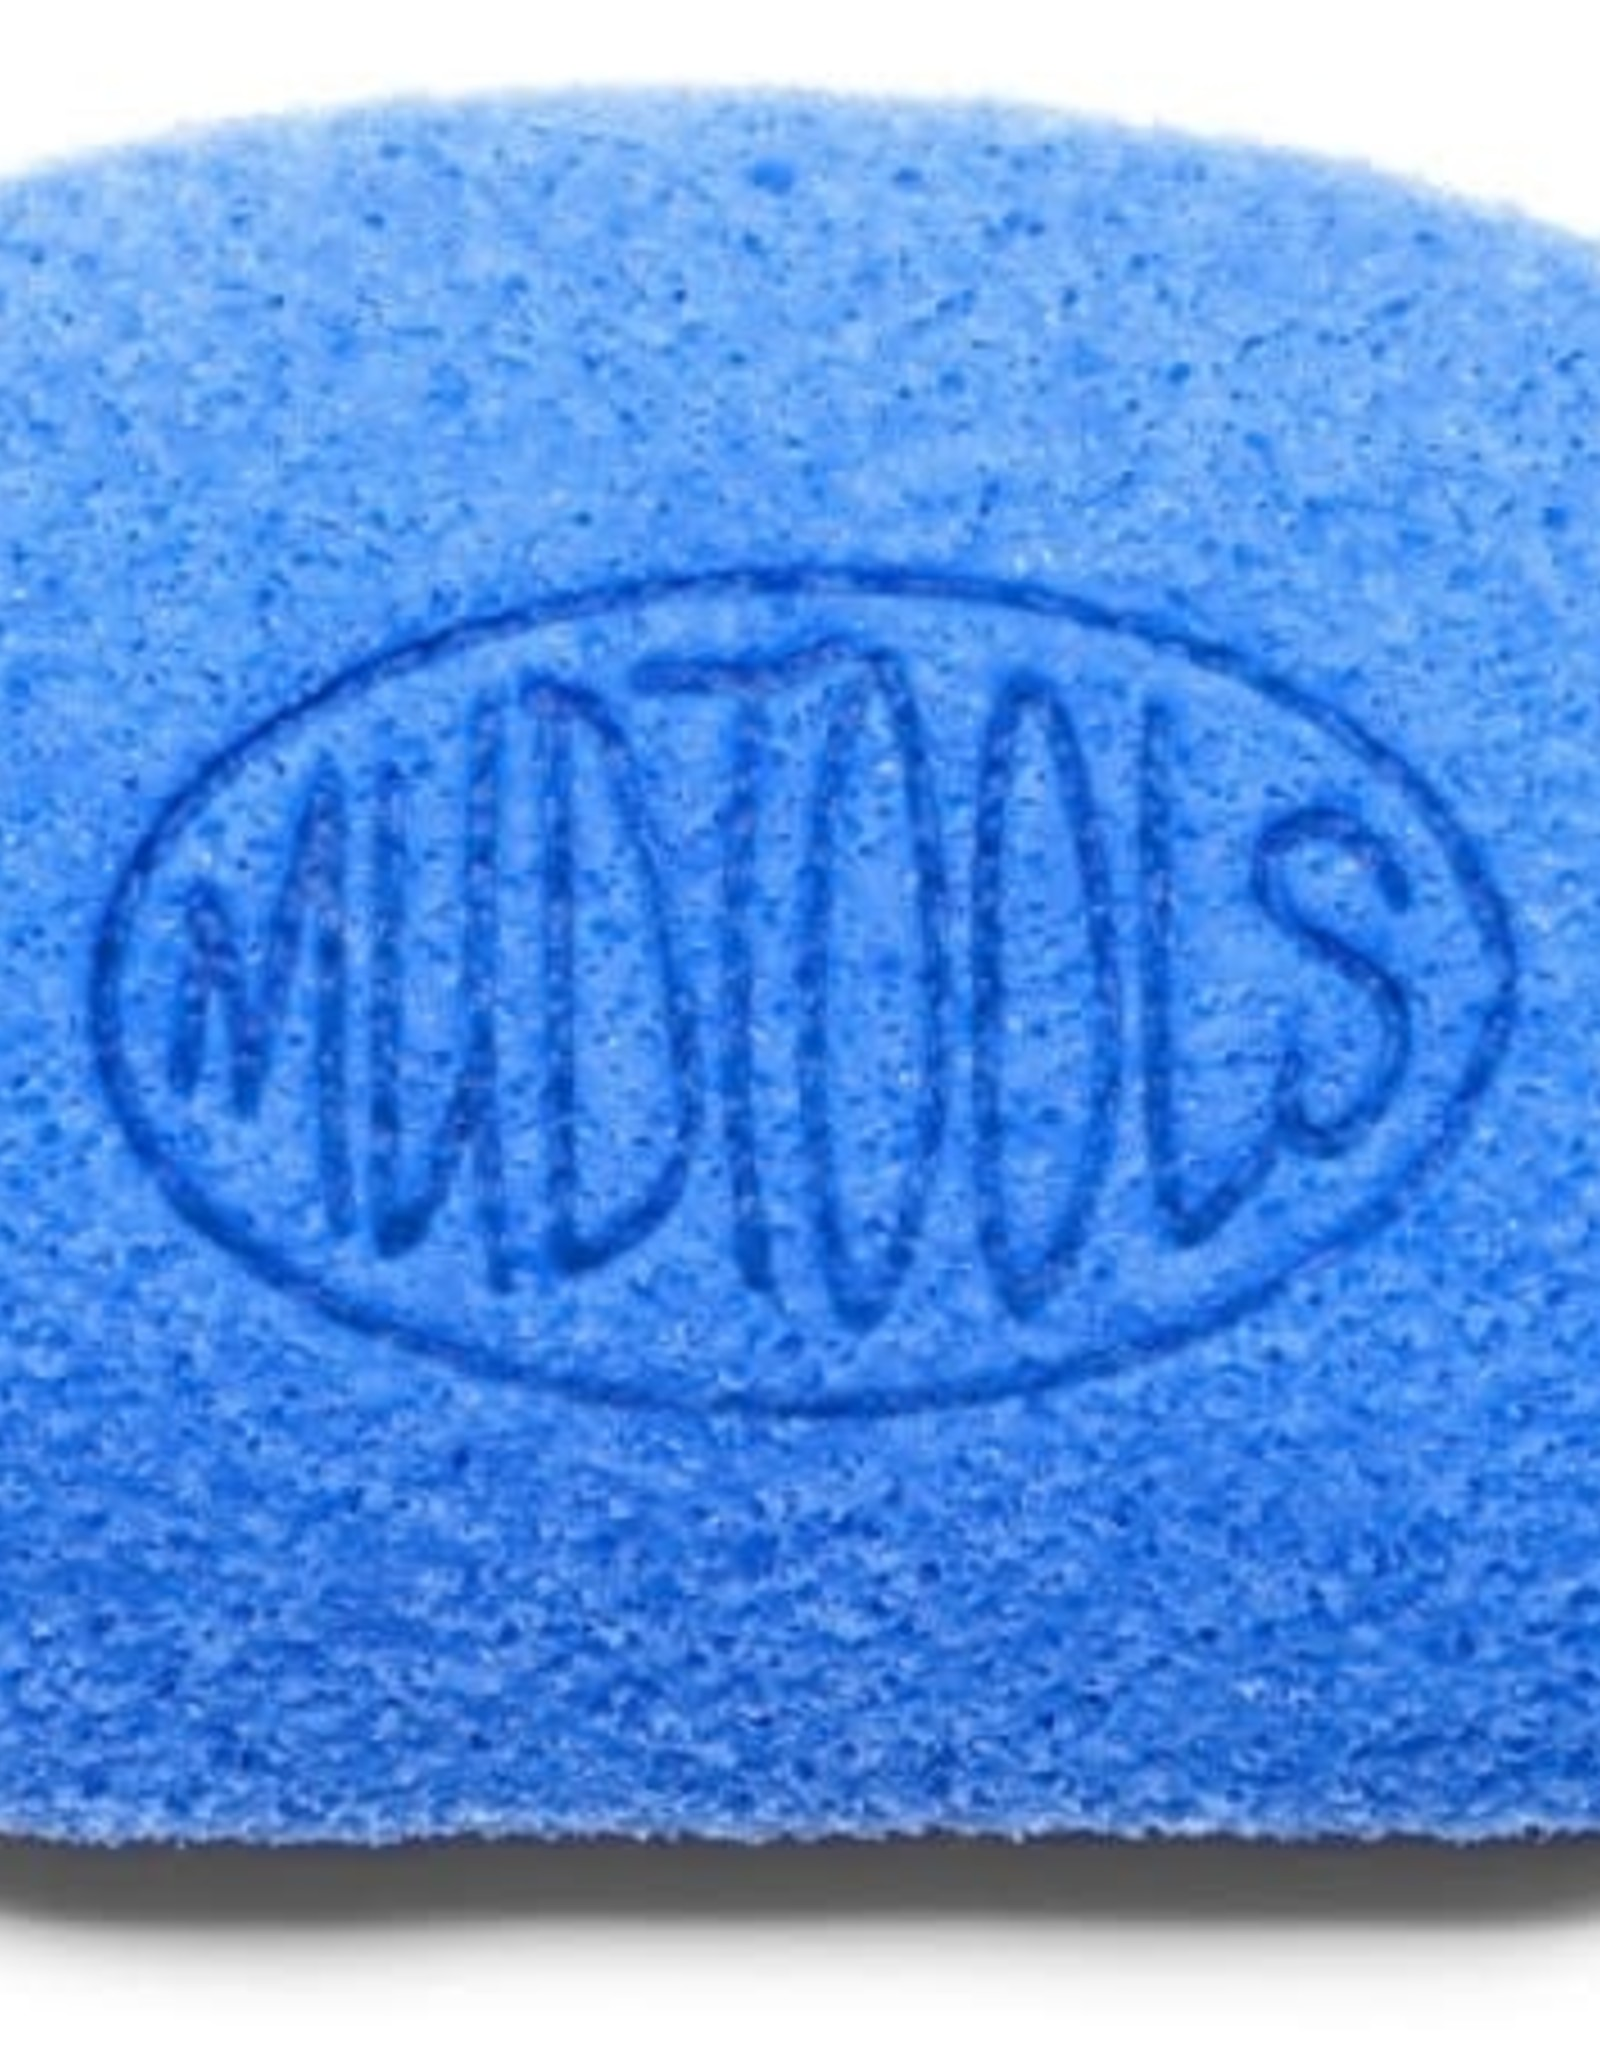 Mudtools Mudsponge